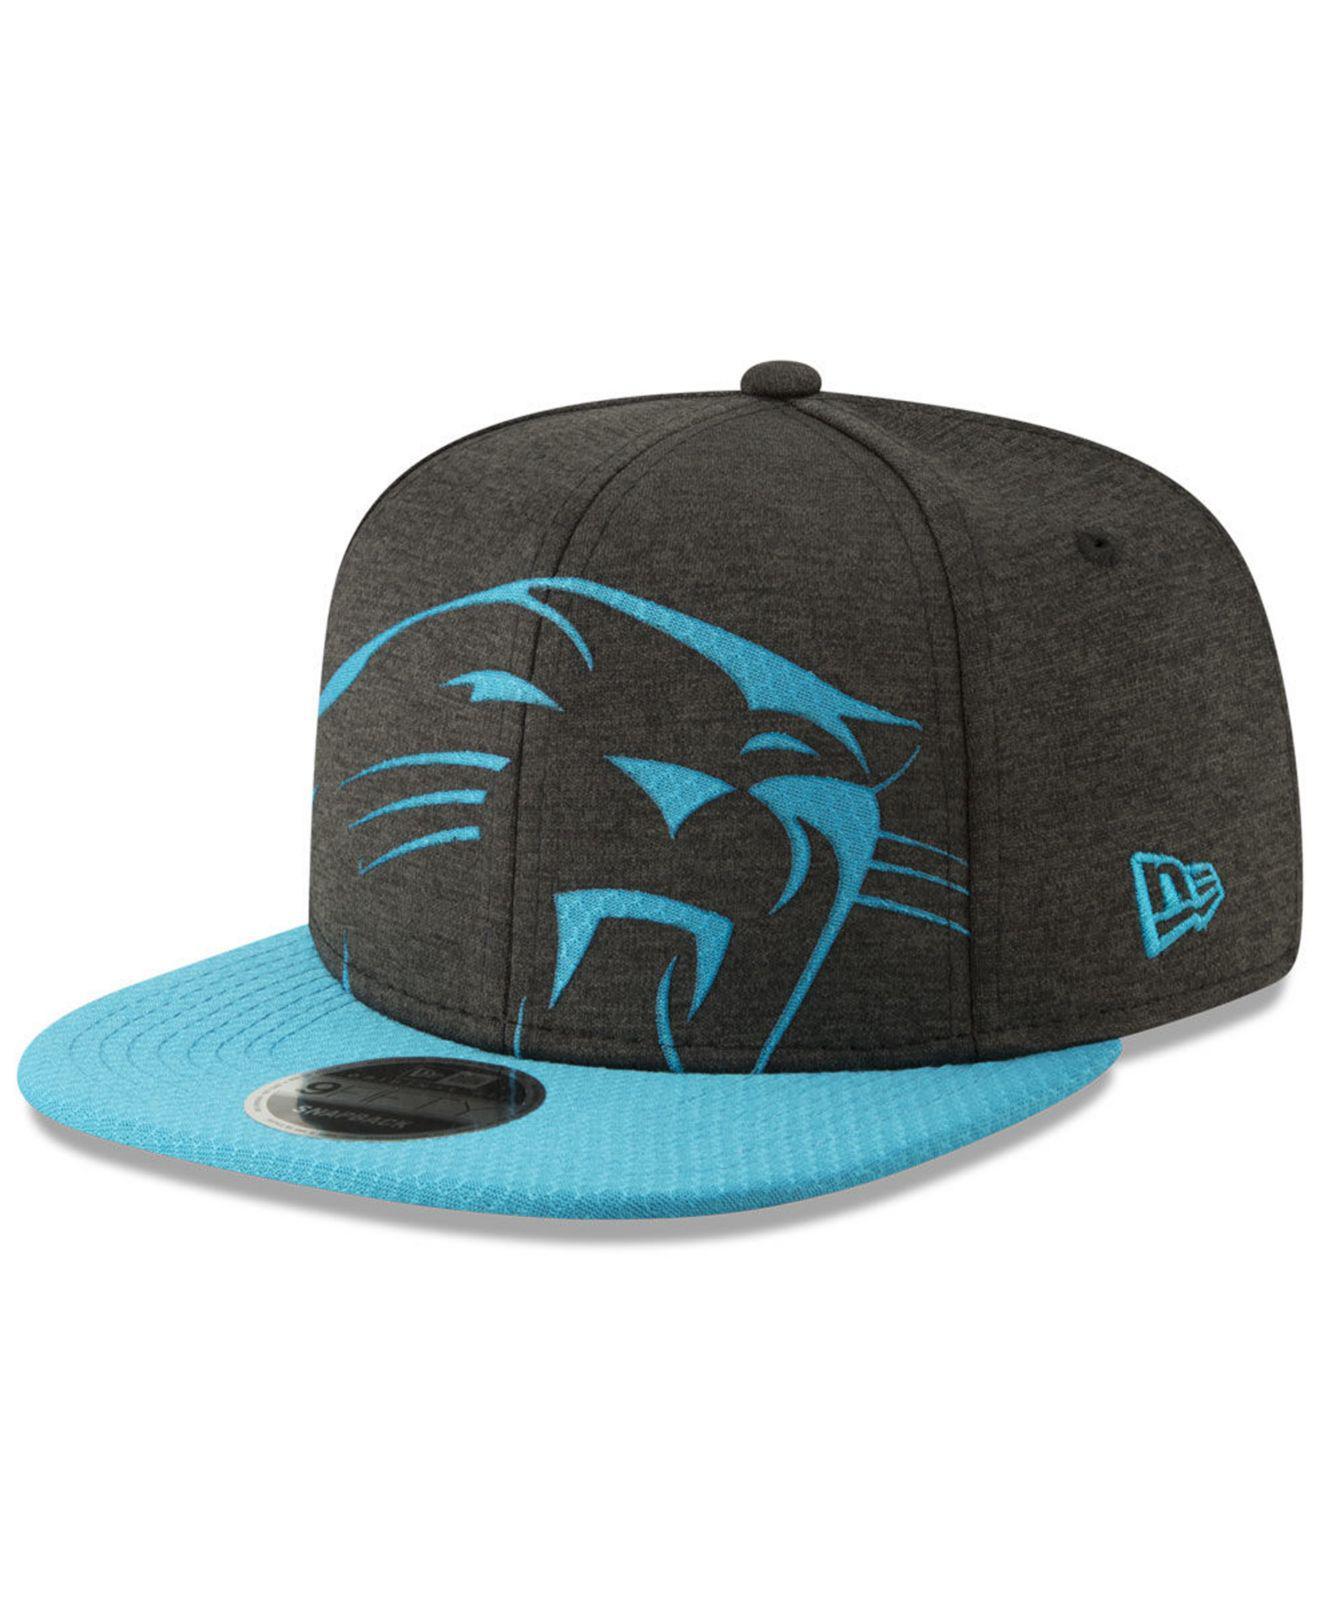 1b0806b0cf0 KTZ. Men s Black Carolina Panthers Oversized Laser Cut 9fifty Snapback Cap